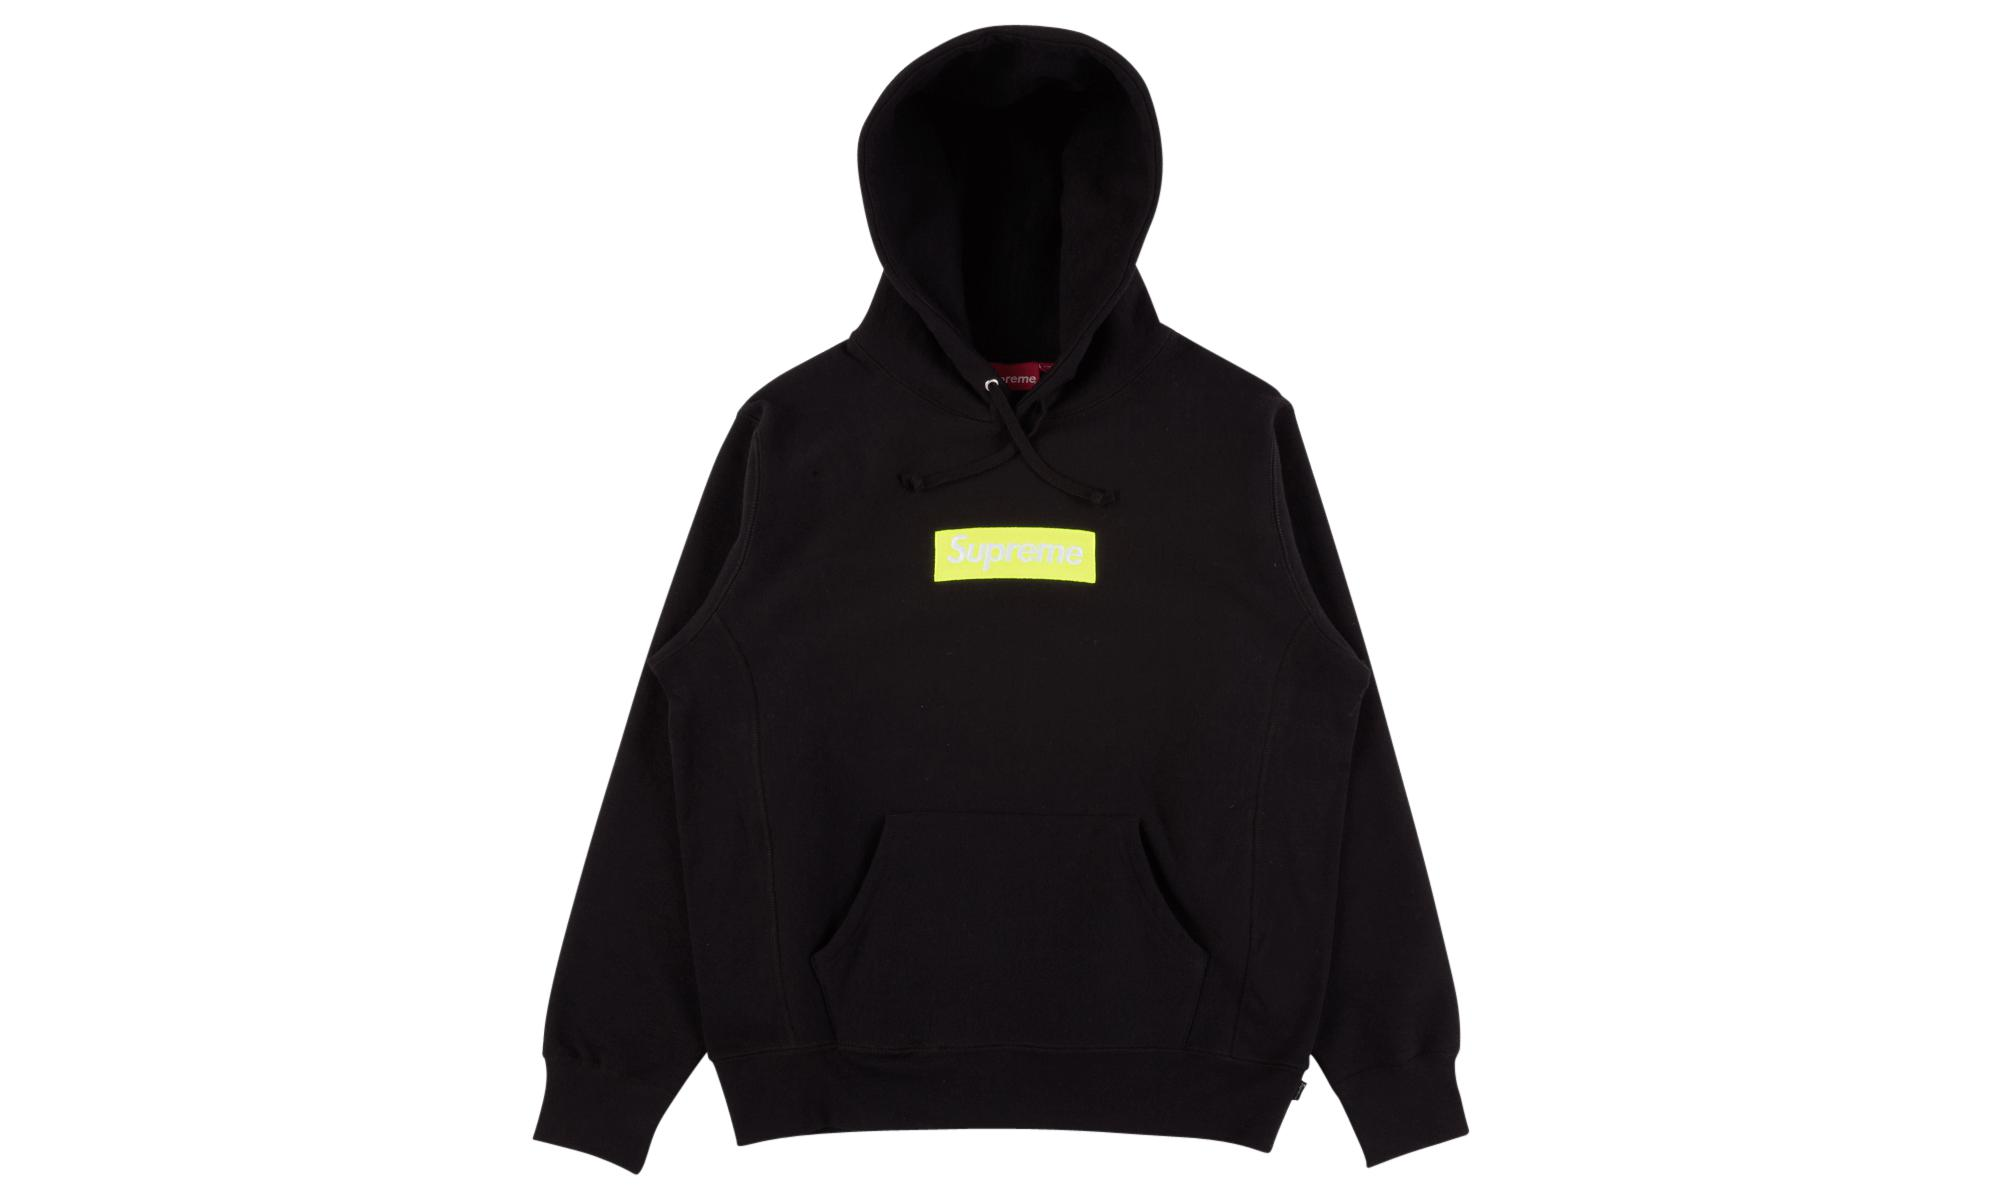 b31d2385 Supreme - Black Box Logo Hooded Sweatshirt 'fw17' for Men - Lyst. View  fullscreen